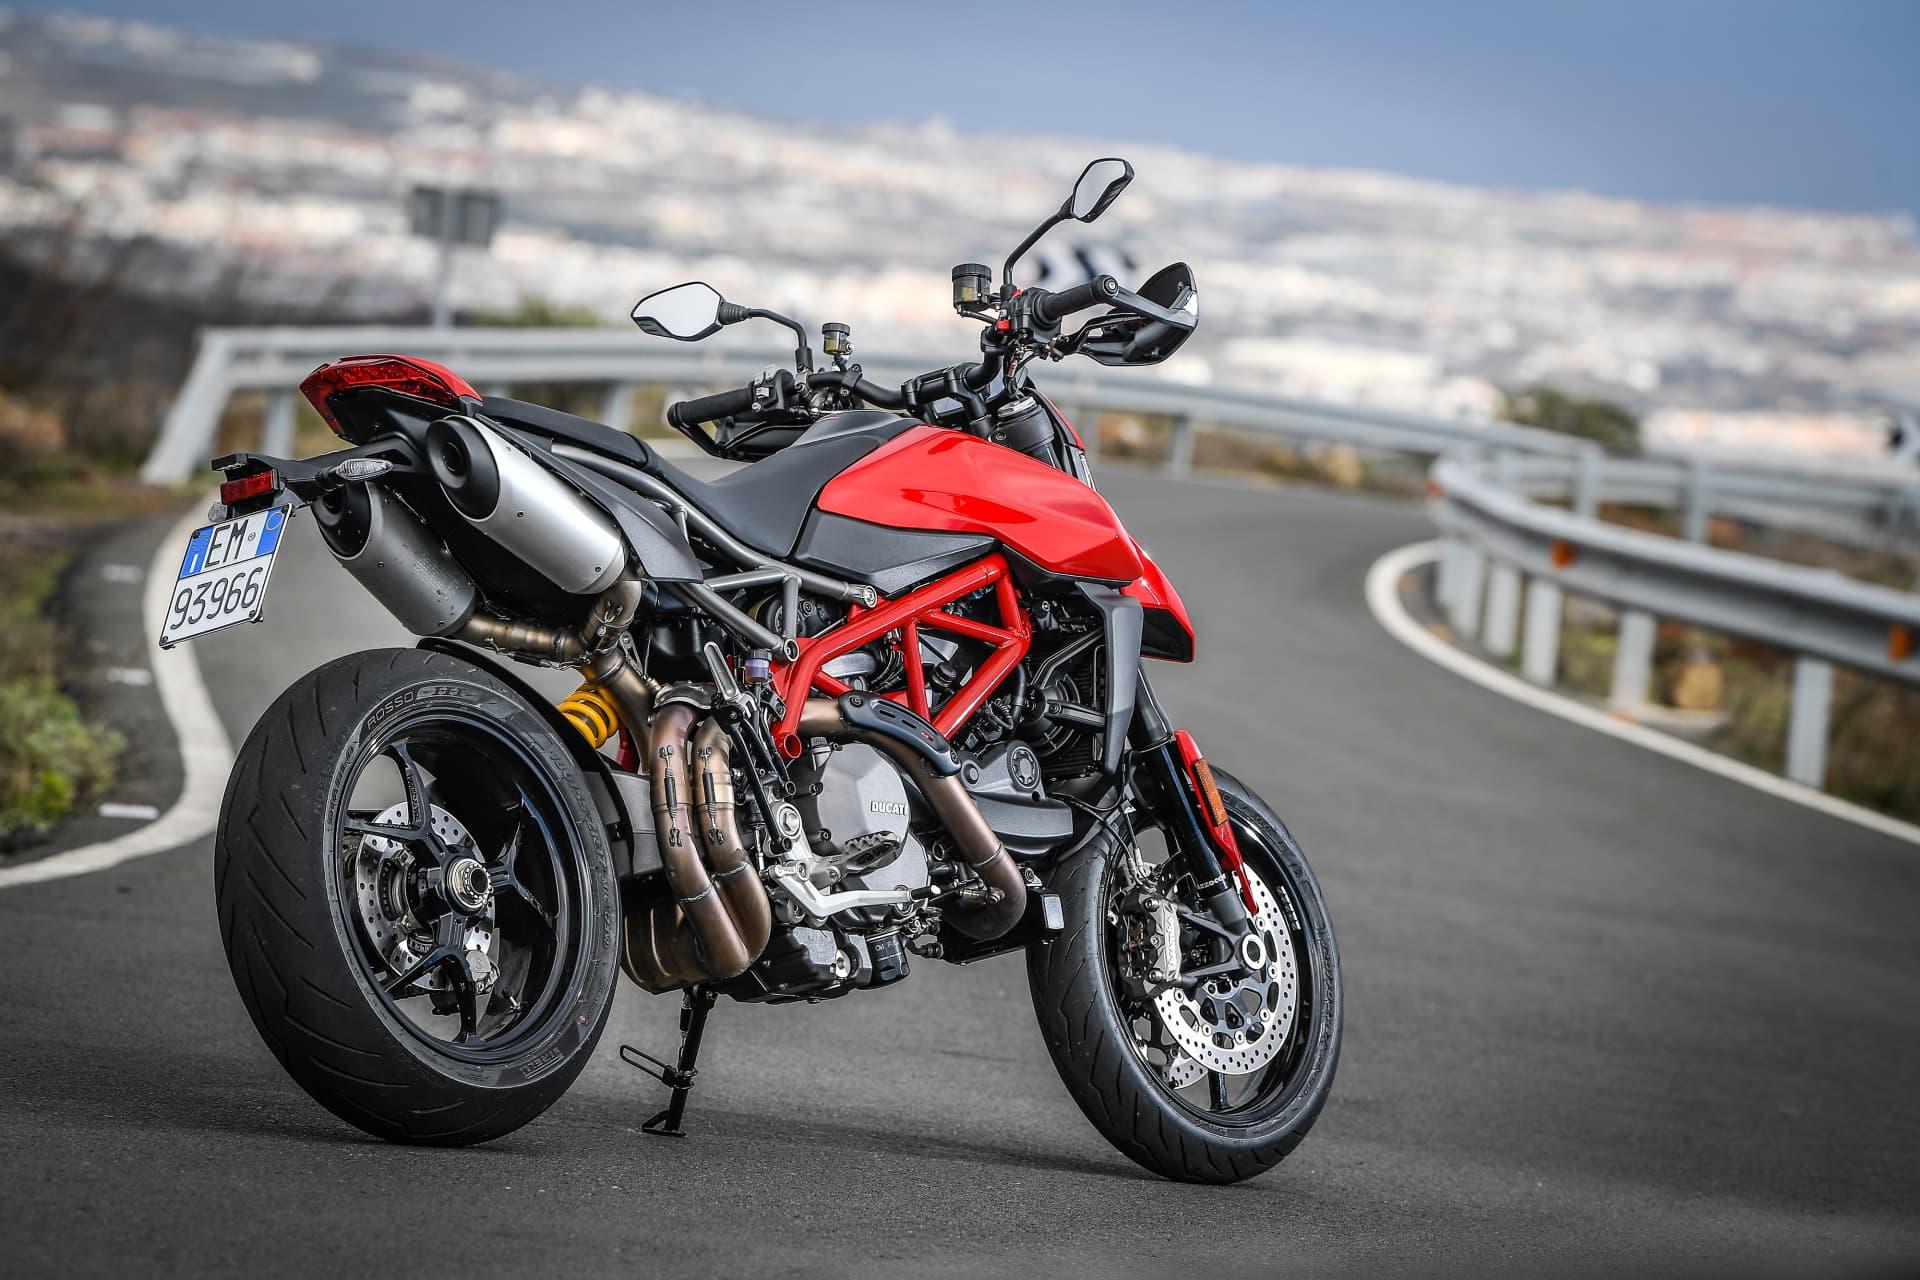 Ducati Hypermotard 950 Static 03 Uc70265 Mid